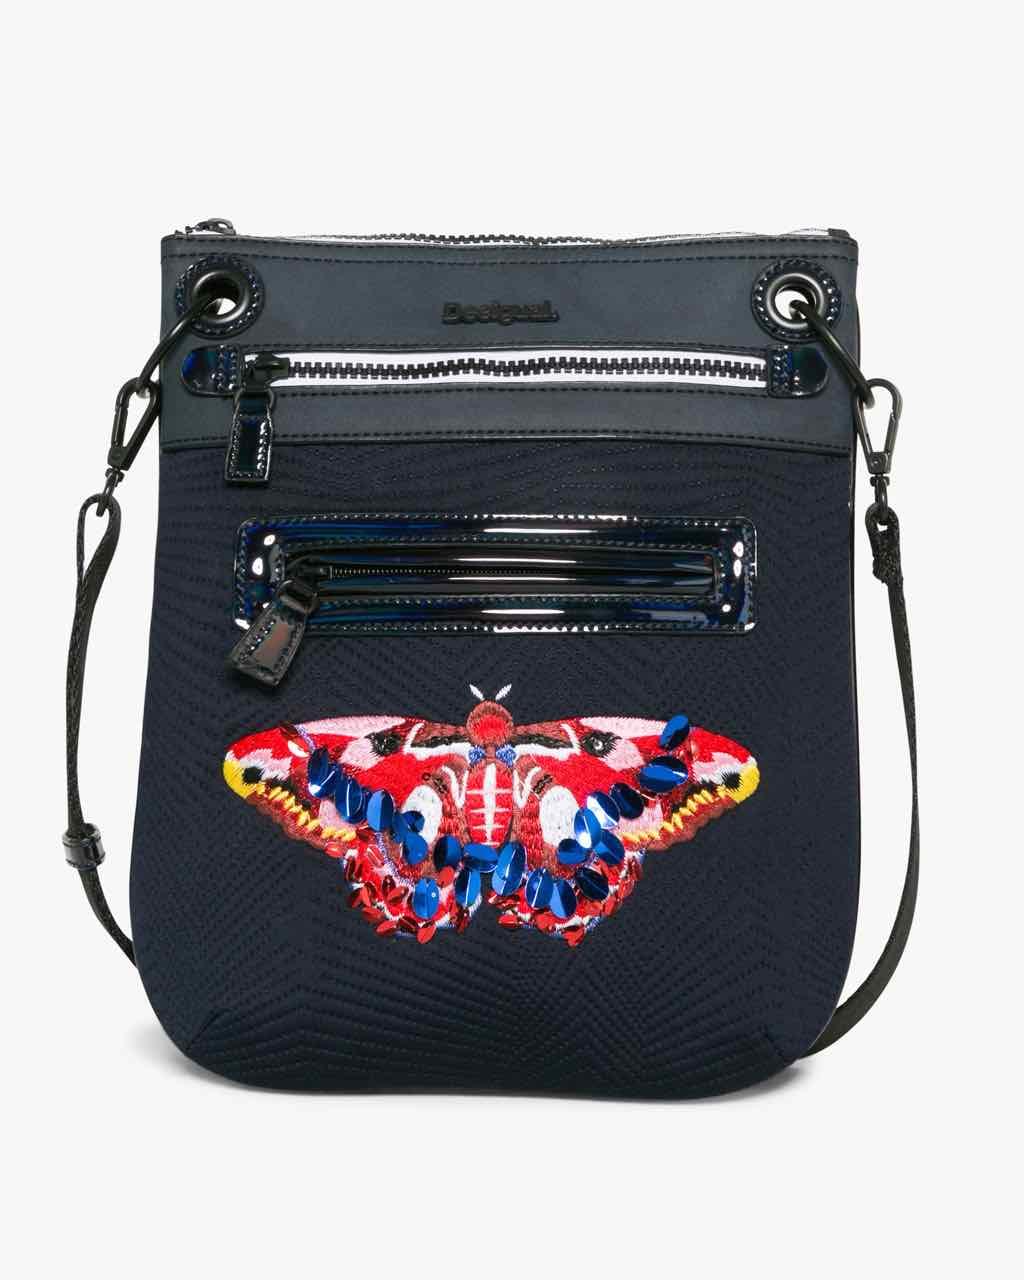 17WAXFTK_5098 Desigual Bag Bandolera Polilla Roja Buy Online